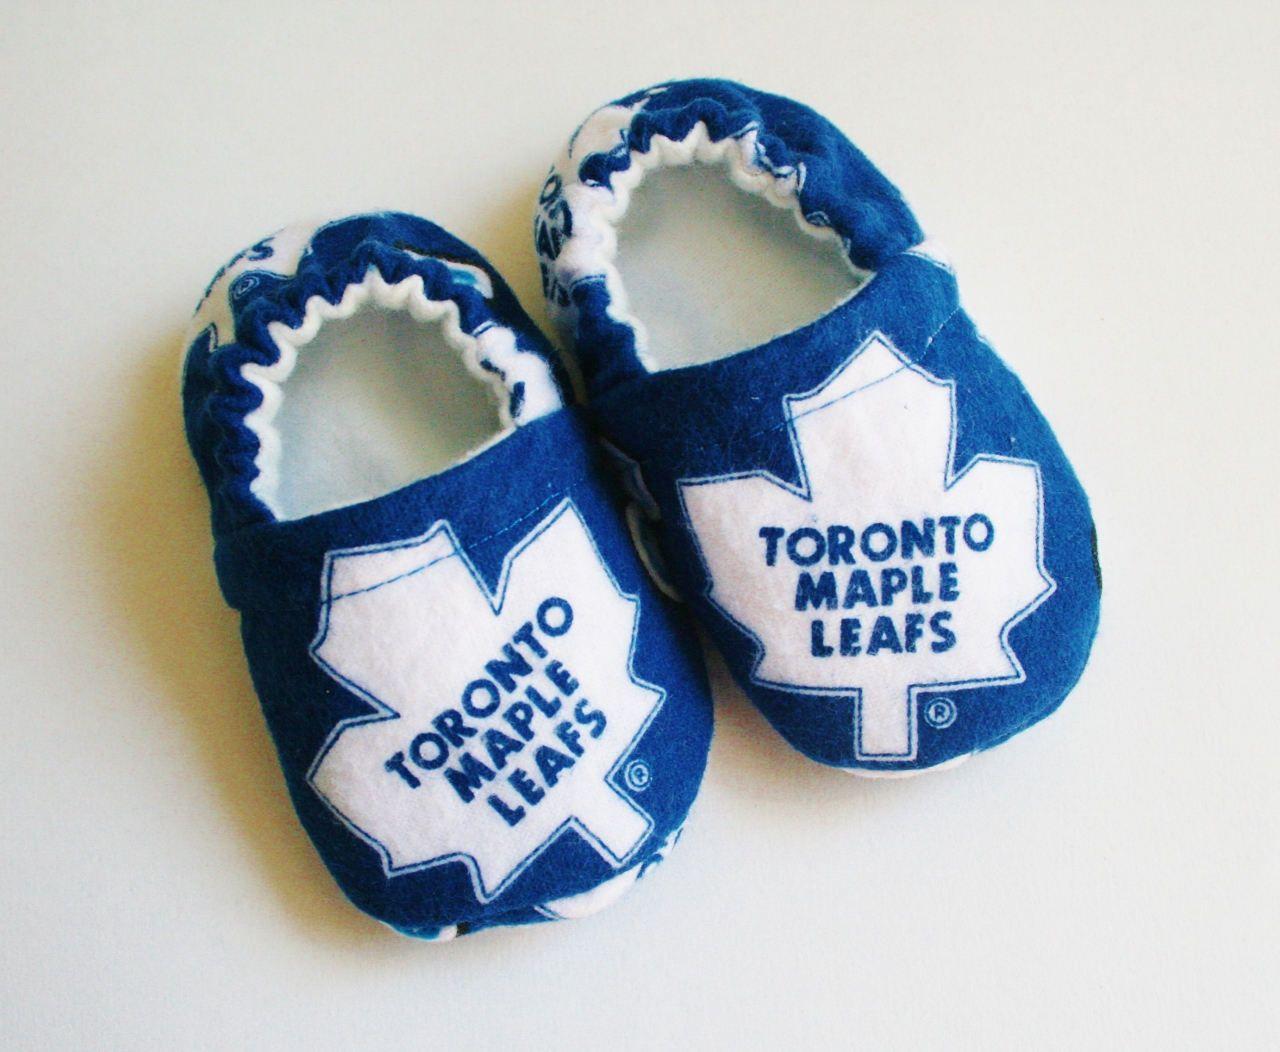 timeless design de8bb 302c6 Toronto Maple Leafs hockey team baby/toddler cotton slippers ...